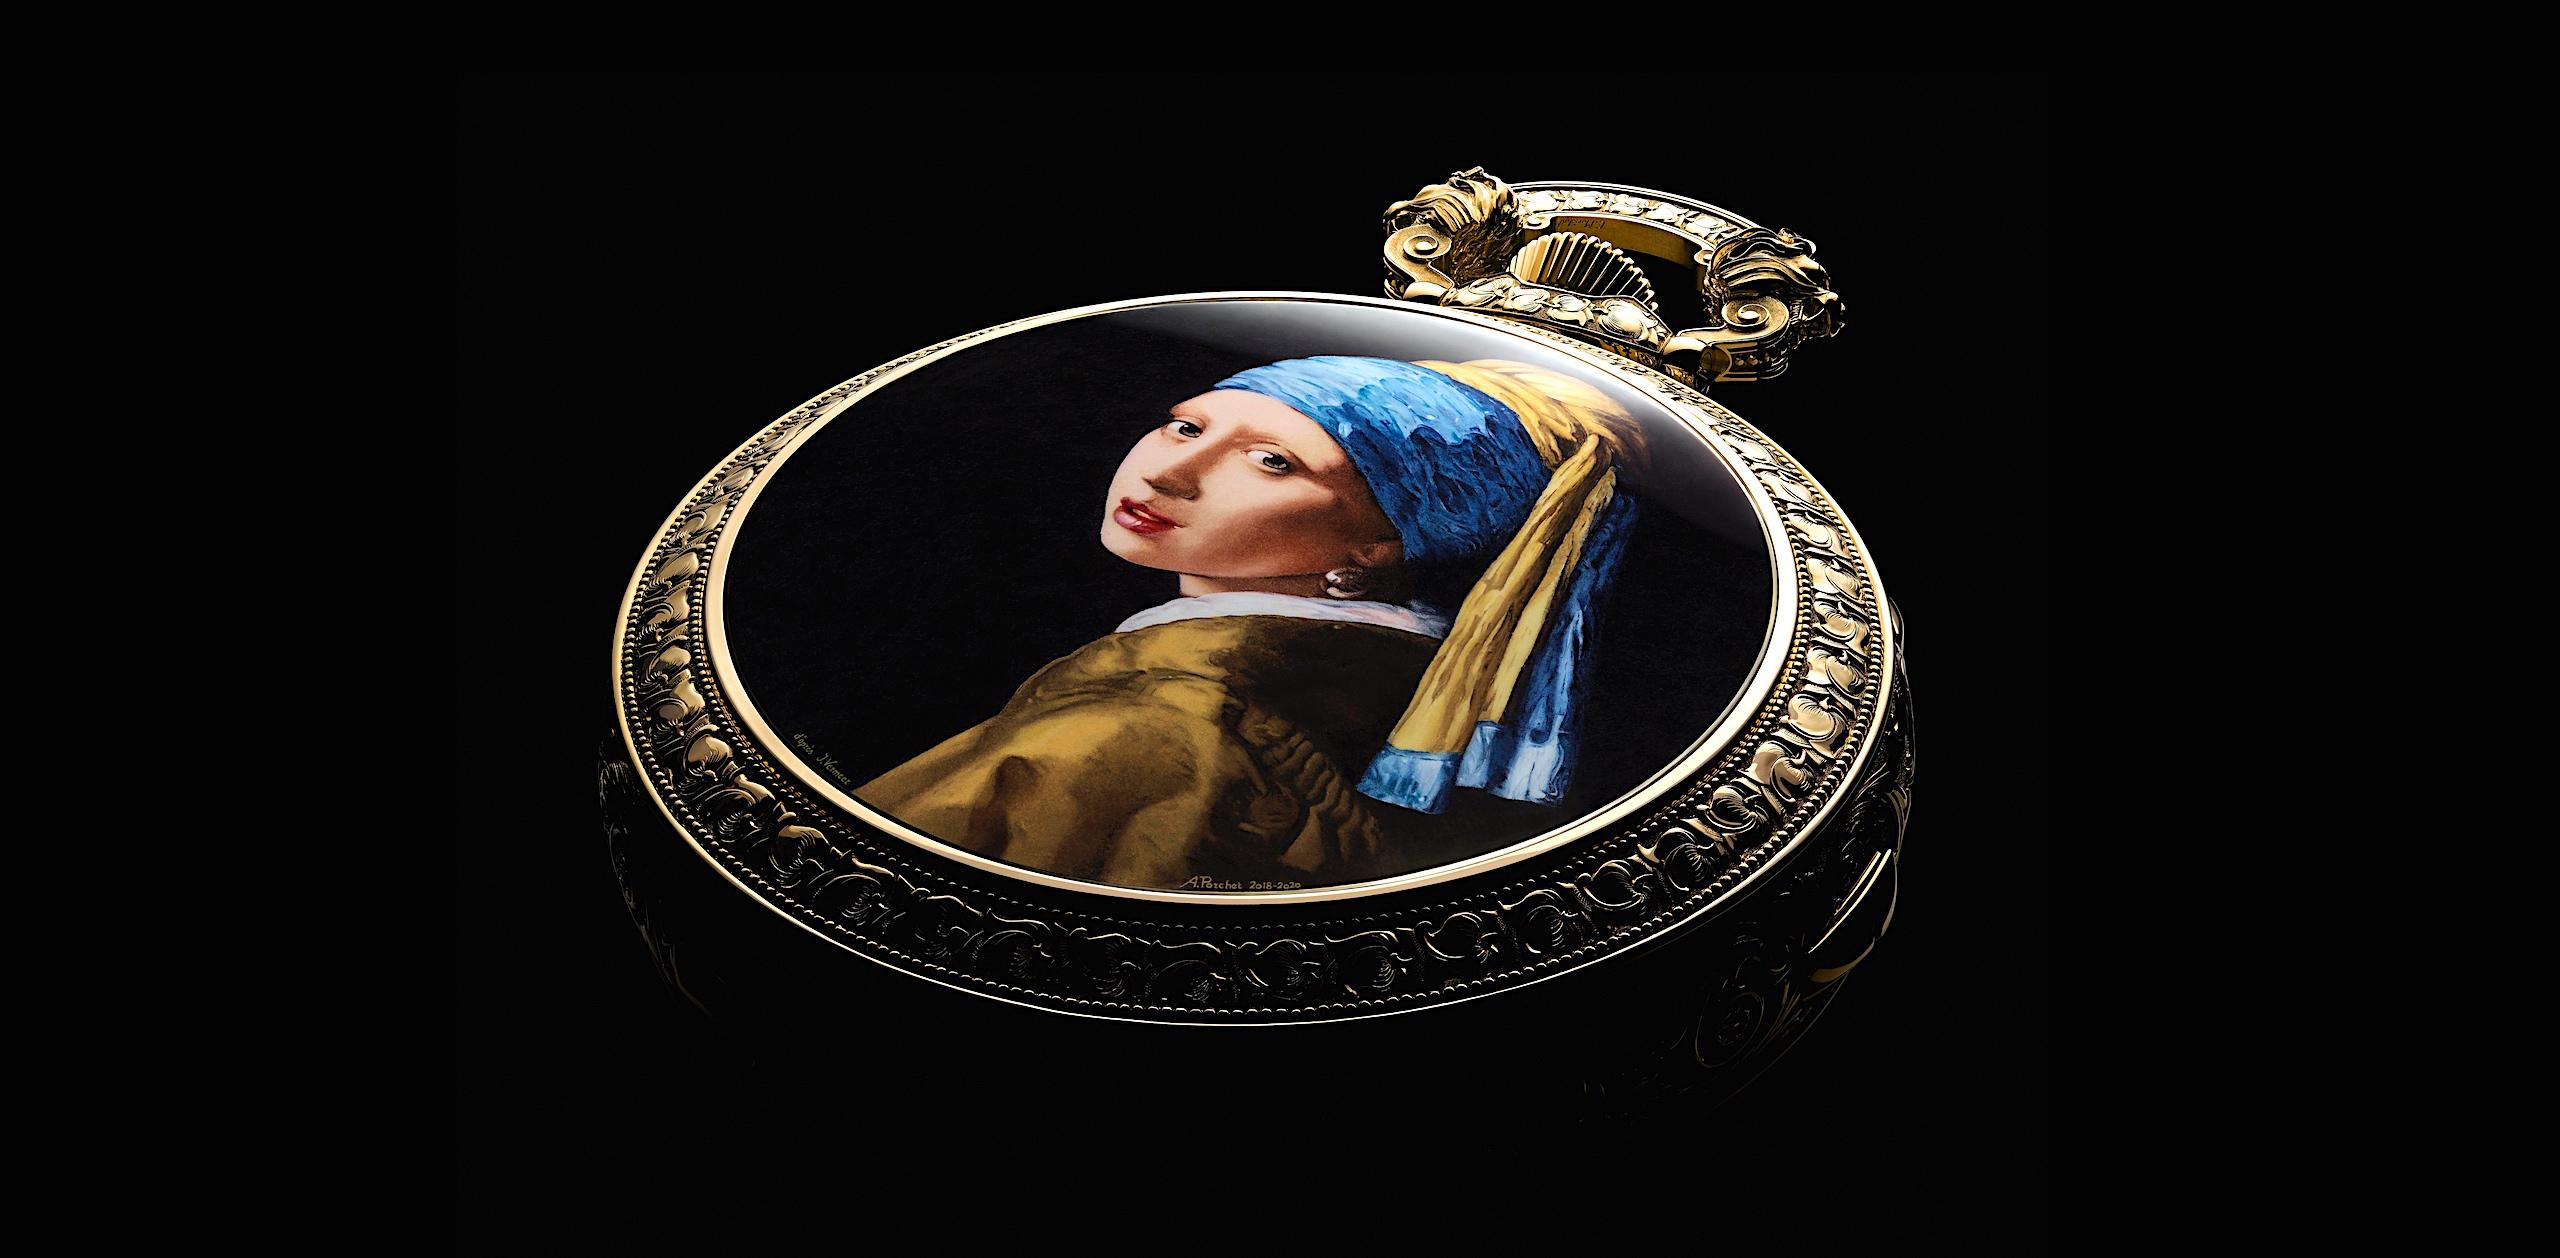 Vacheron Constantin Les Cabinotiers Westminster Sonnerie – Tribute to Johannes Vermeer - cover